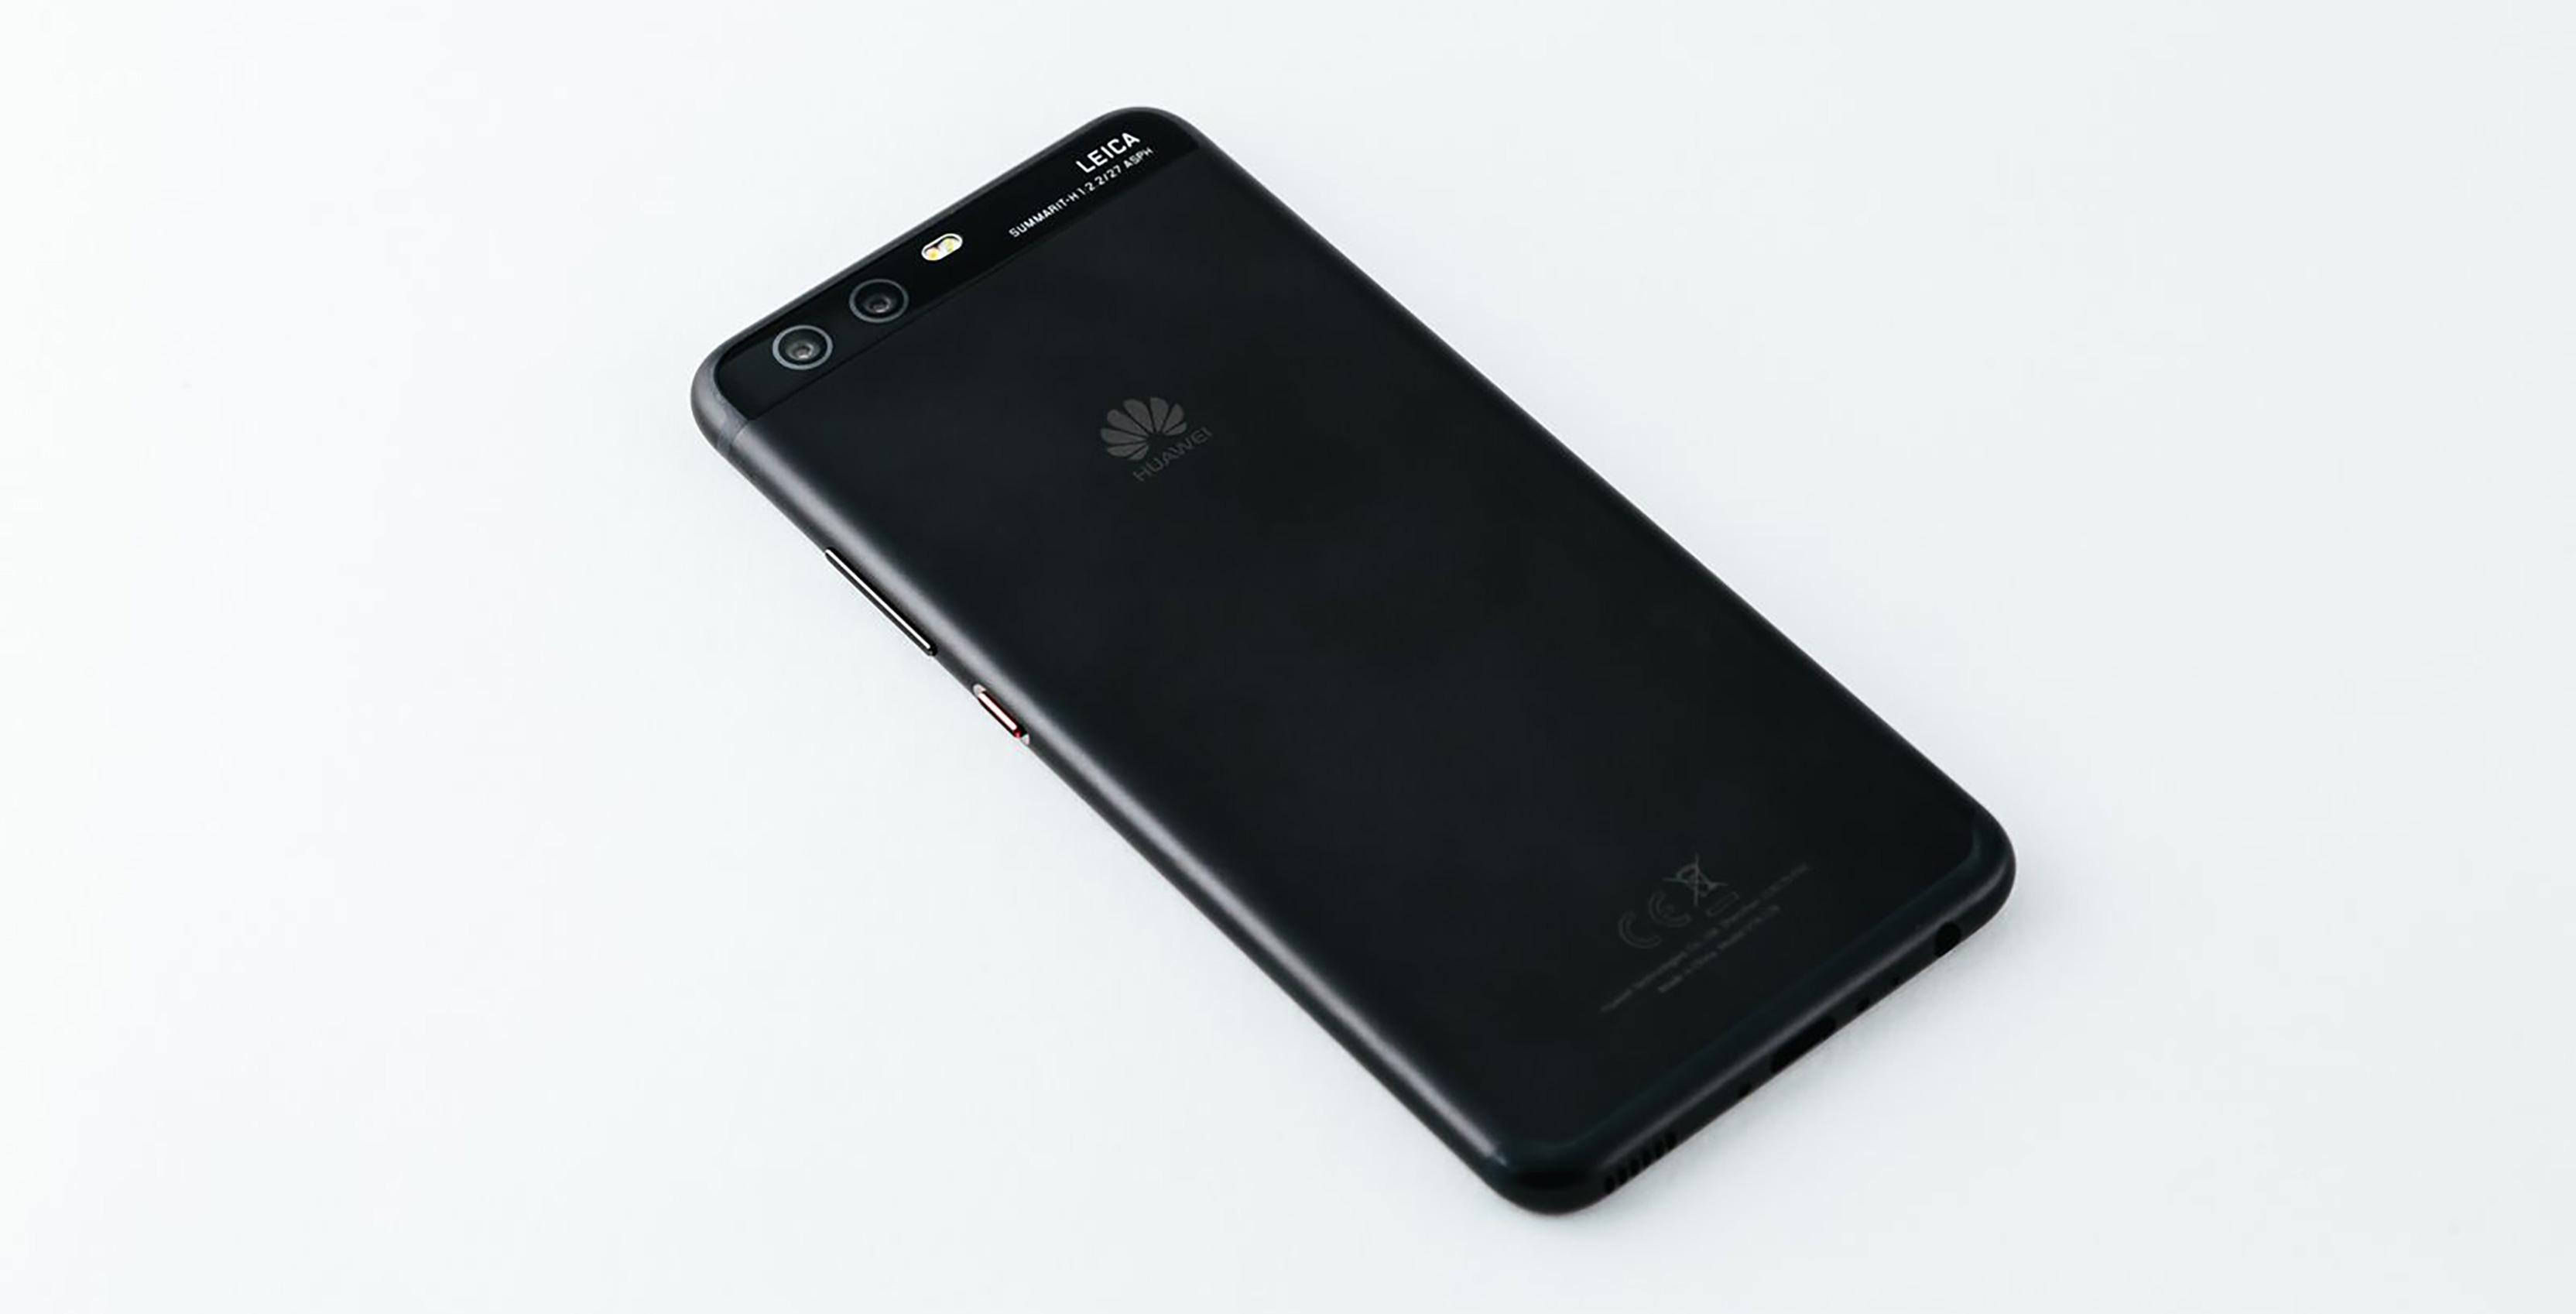 Back of Huawei P10 smartphone